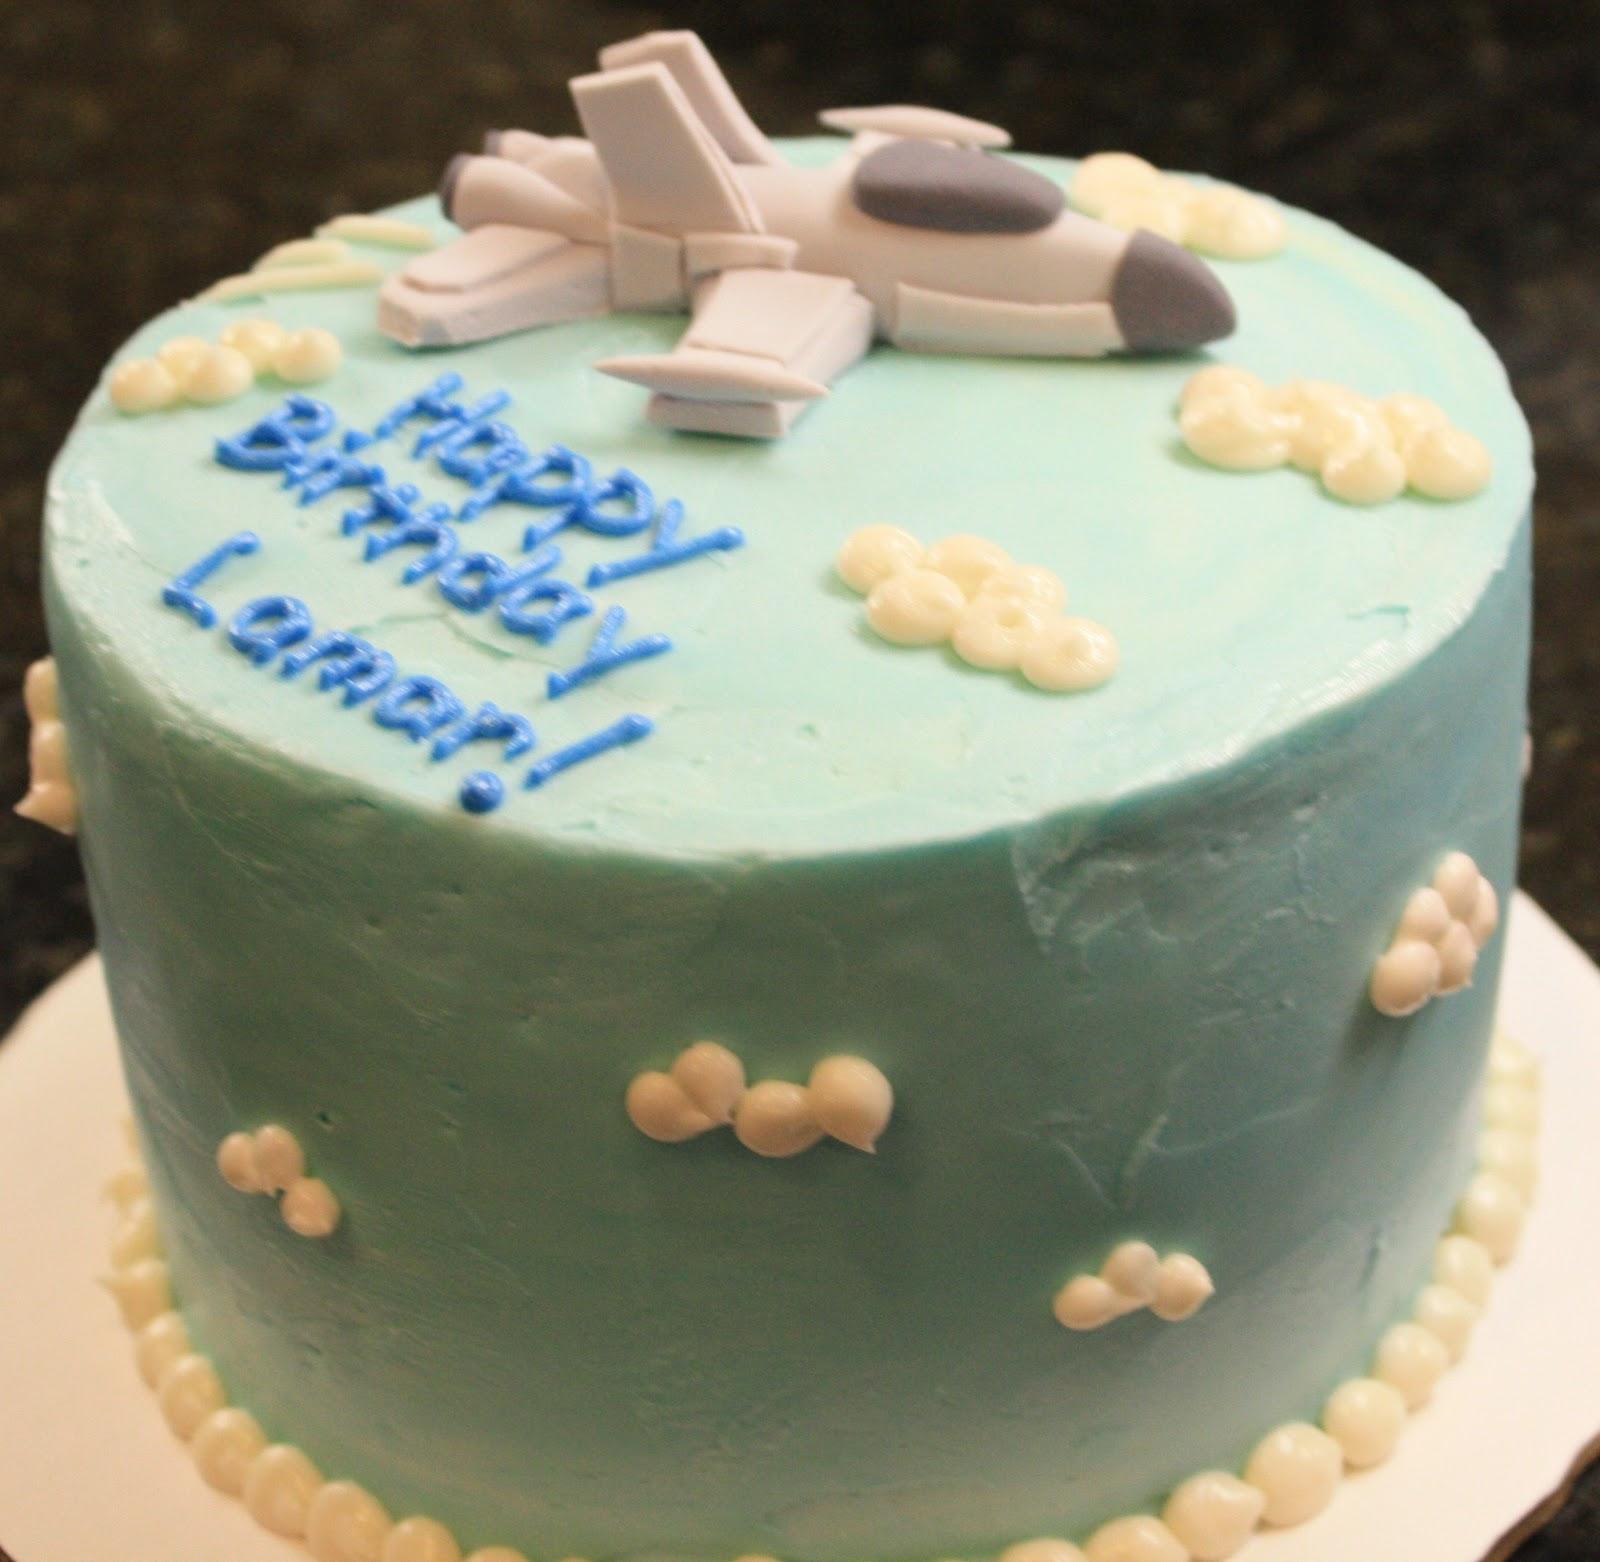 Beccas Topsy Turvy Tales Jet Cake